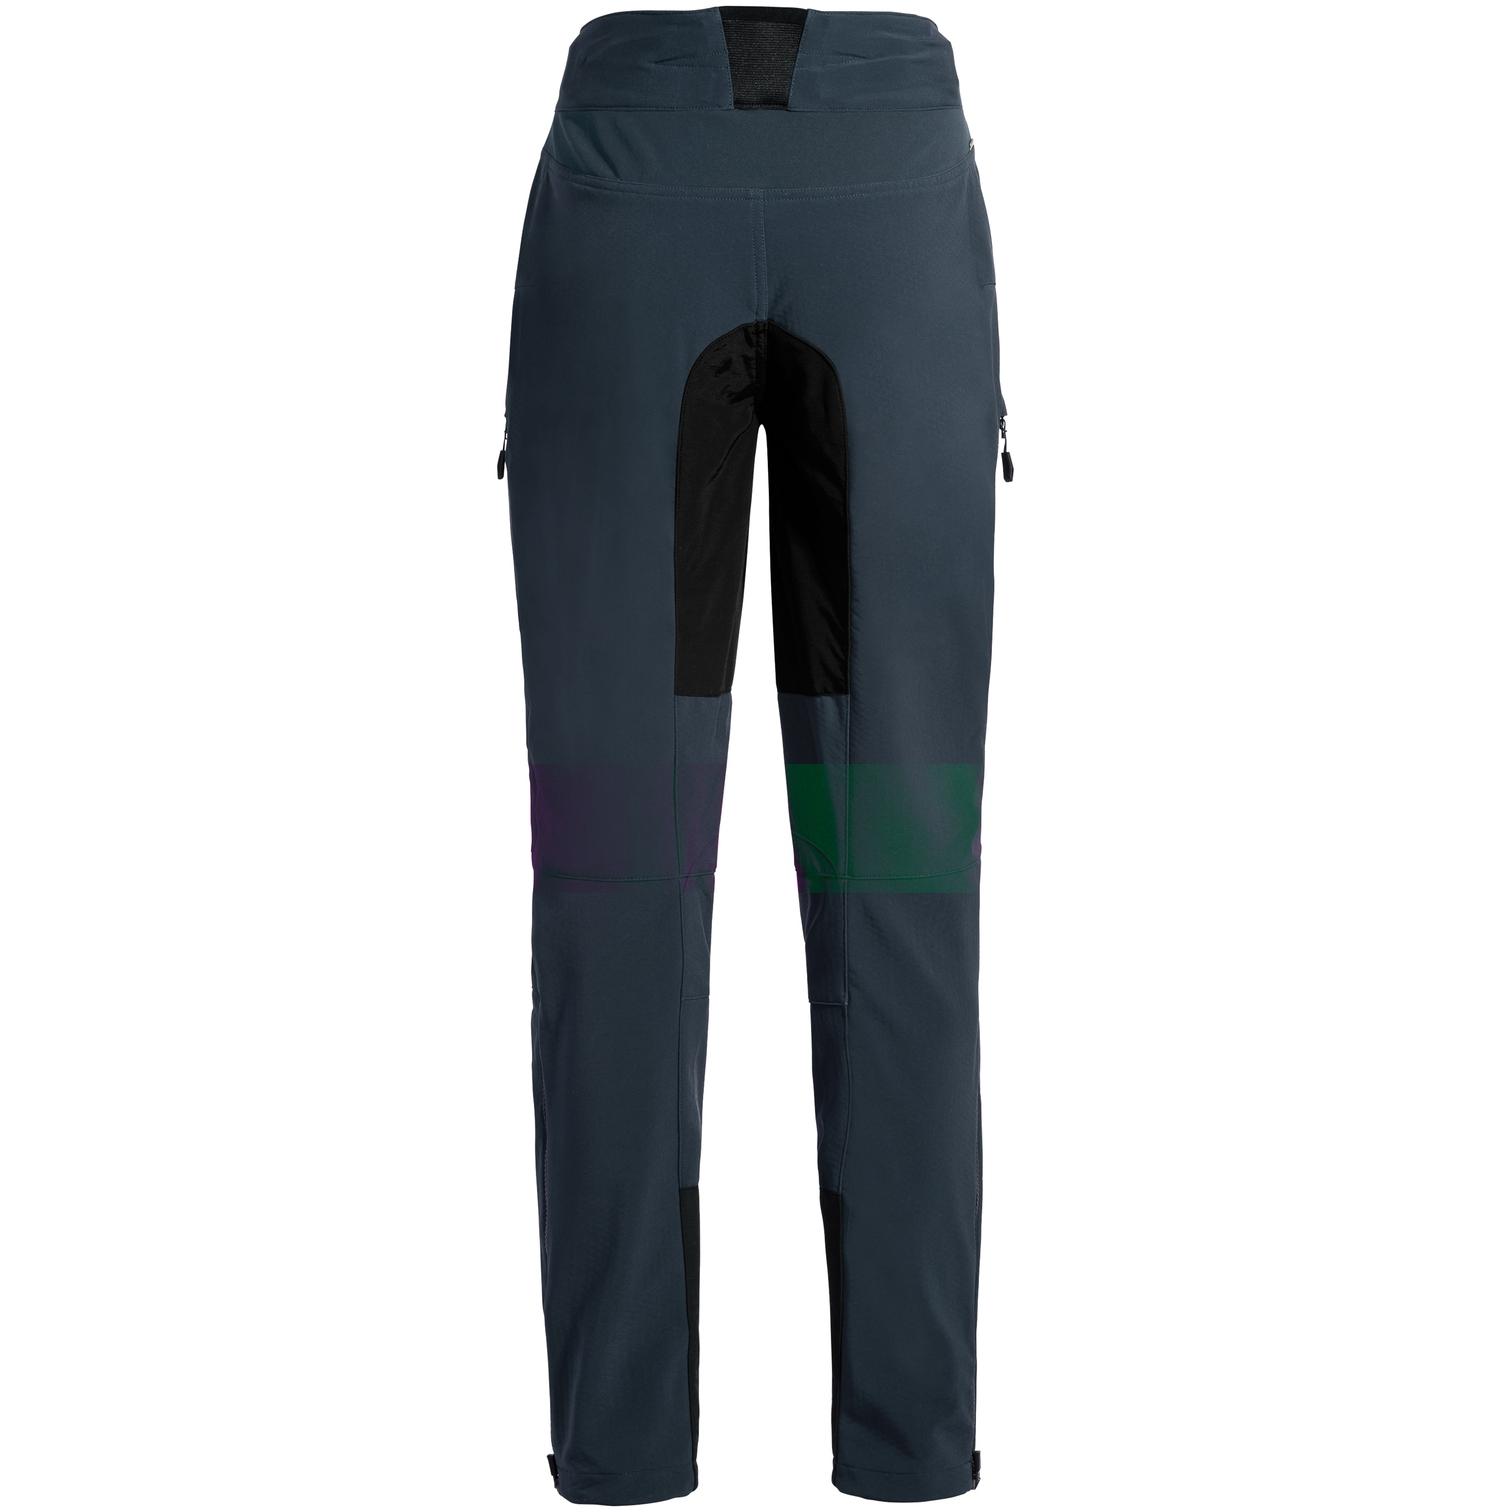 Image of Vaude Women's Qimsa Softshell Pants II - dark sea